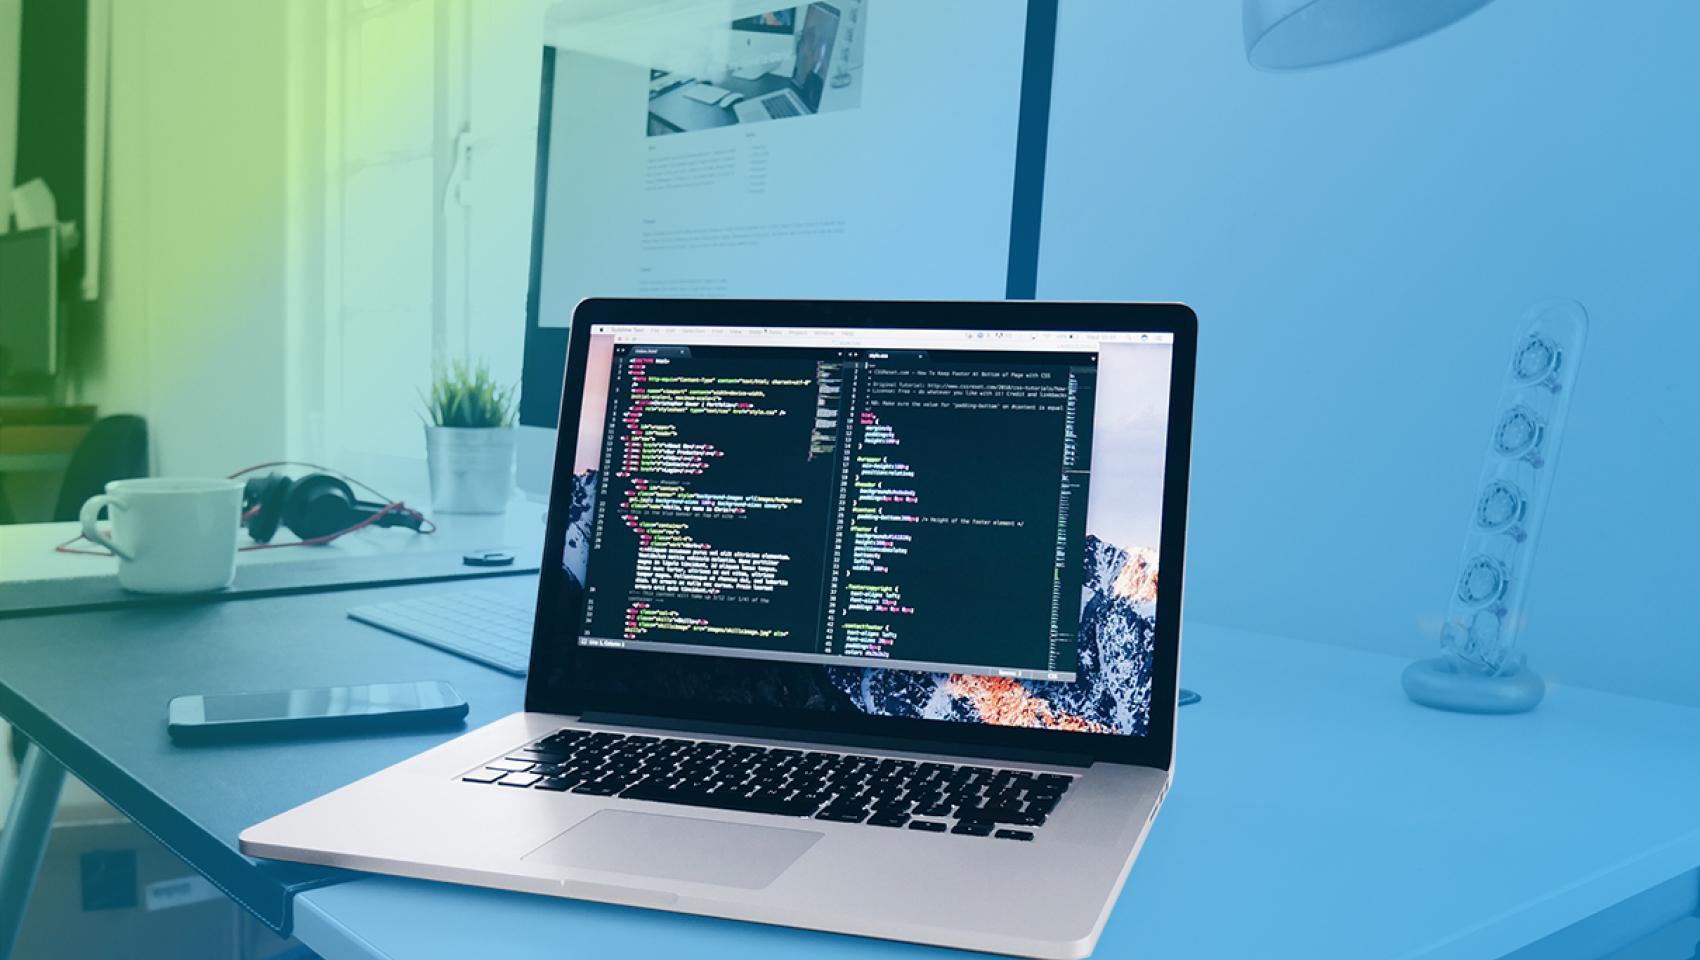 Clean Code and Antipatterns: о важности написания качественного кода